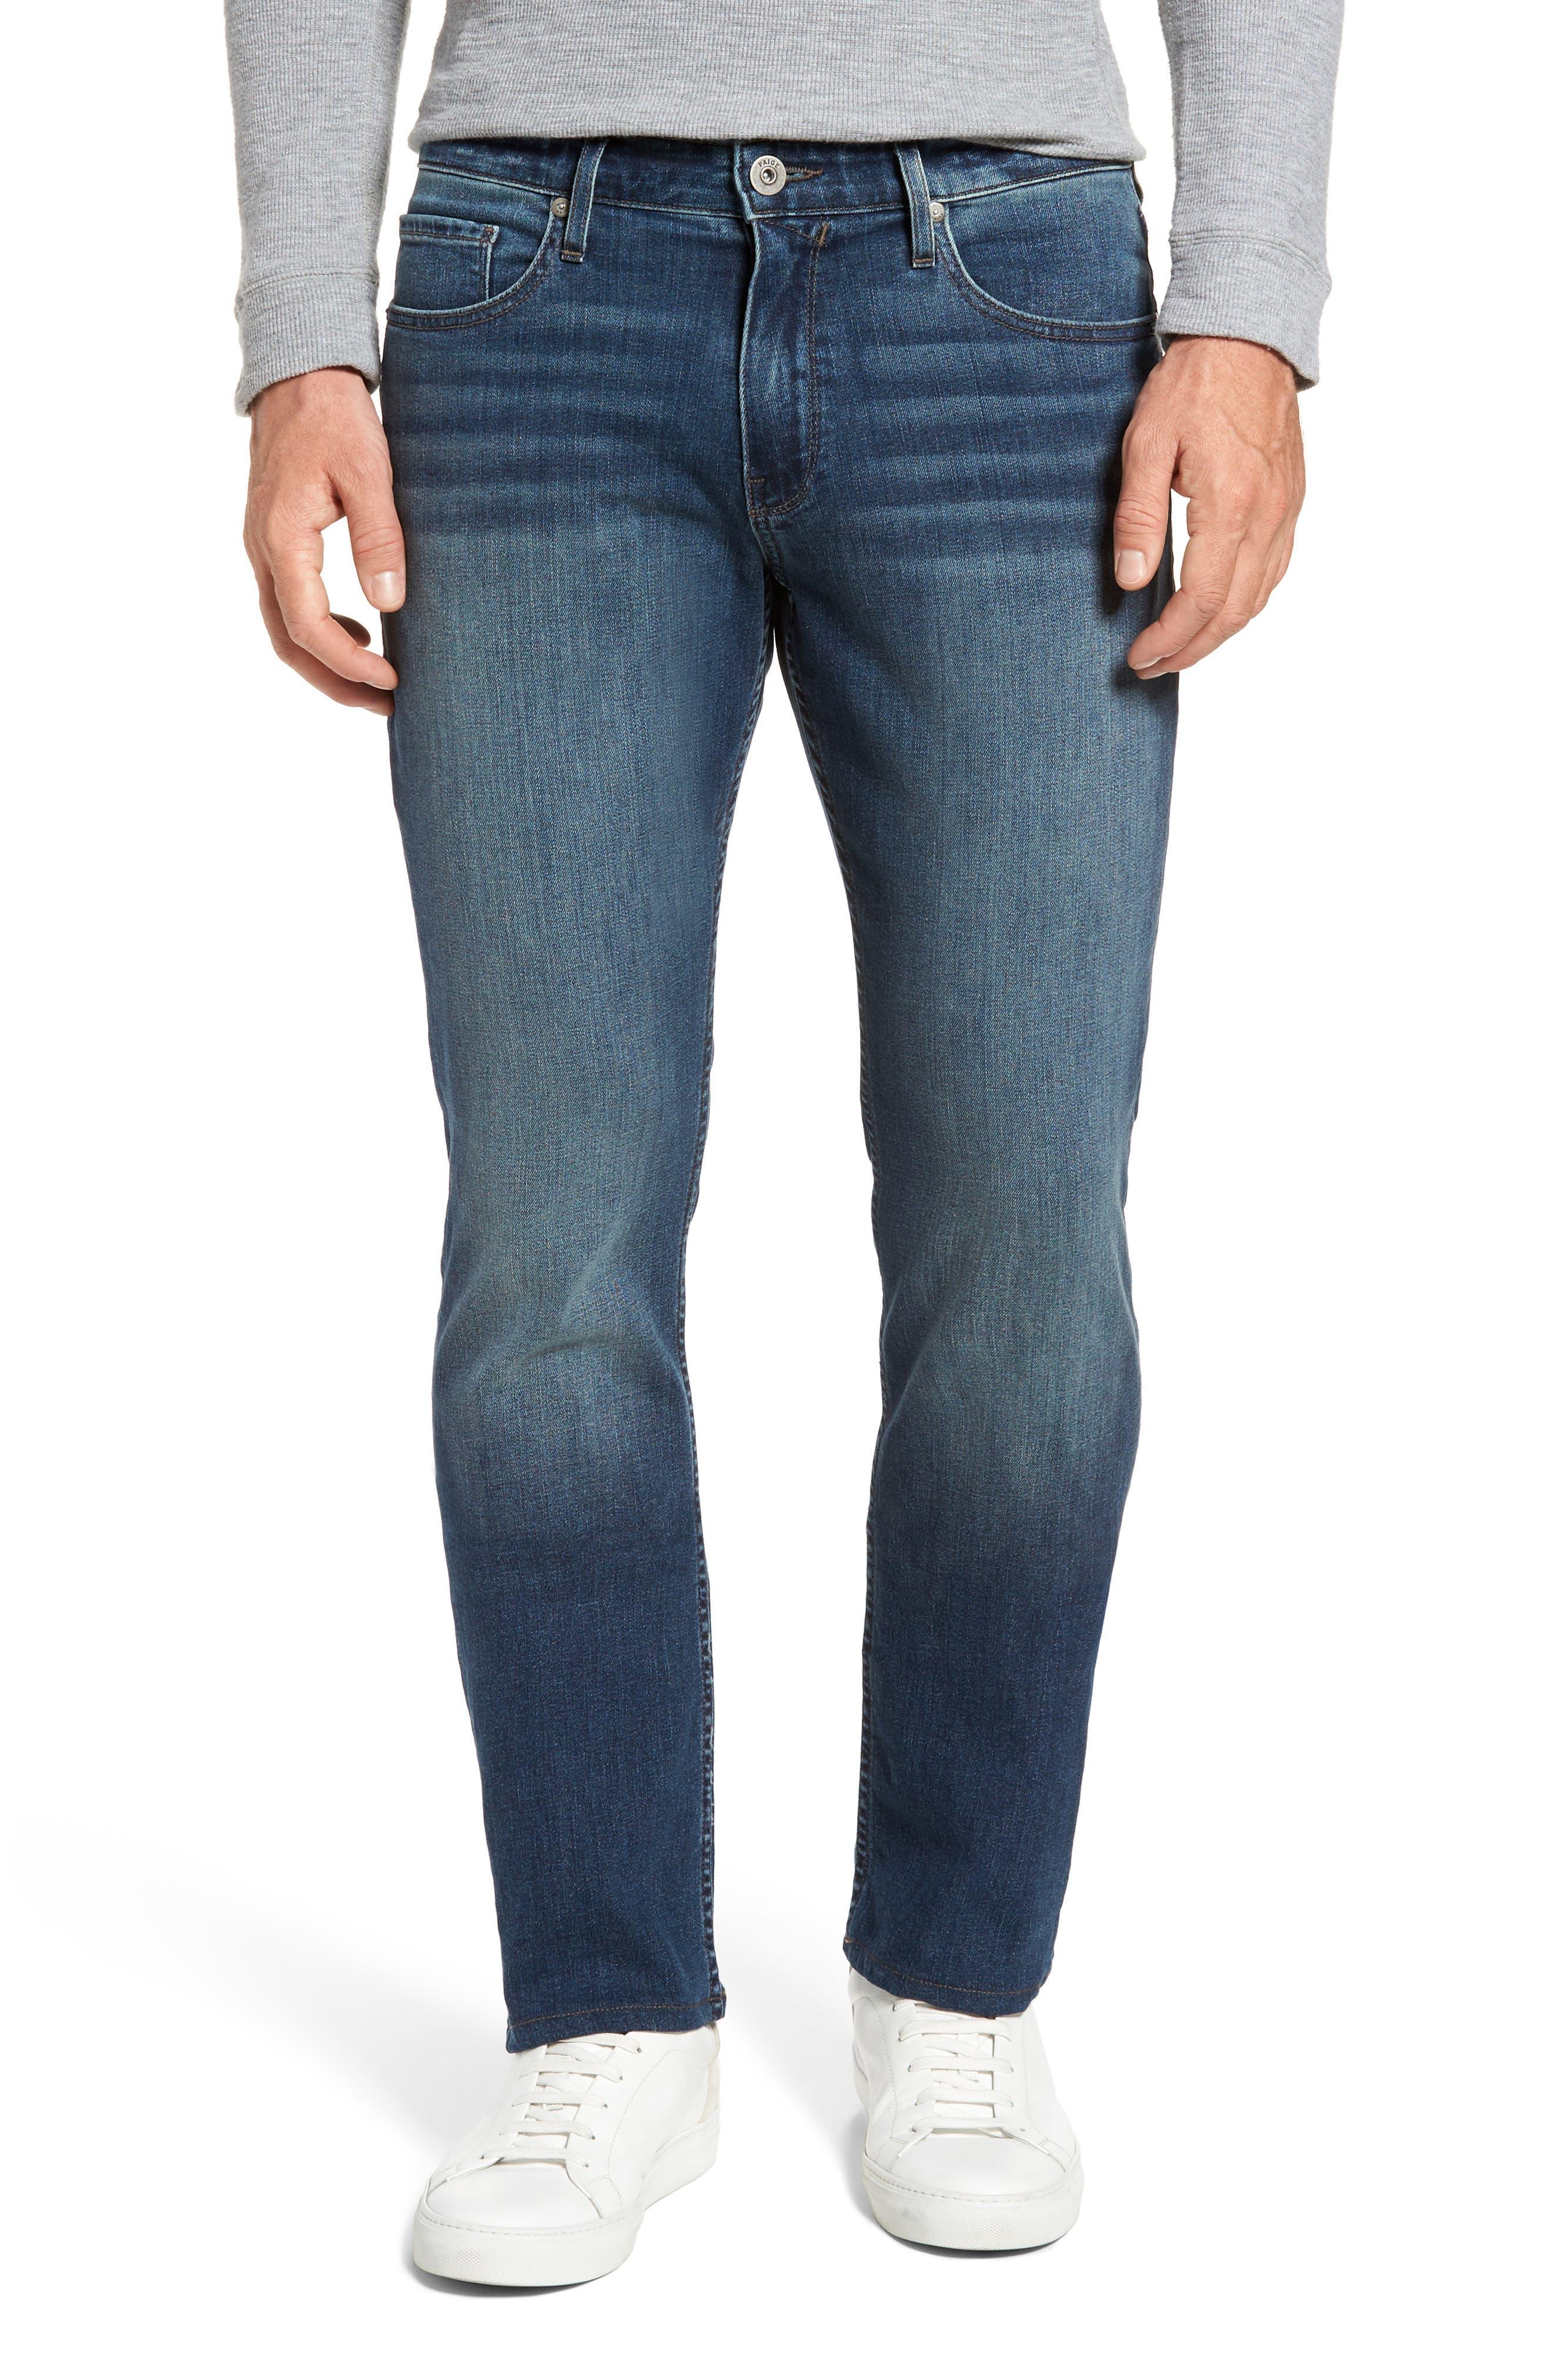 Legacy - Normandie Straight Leg Jeans,                         Main,                         color, 400